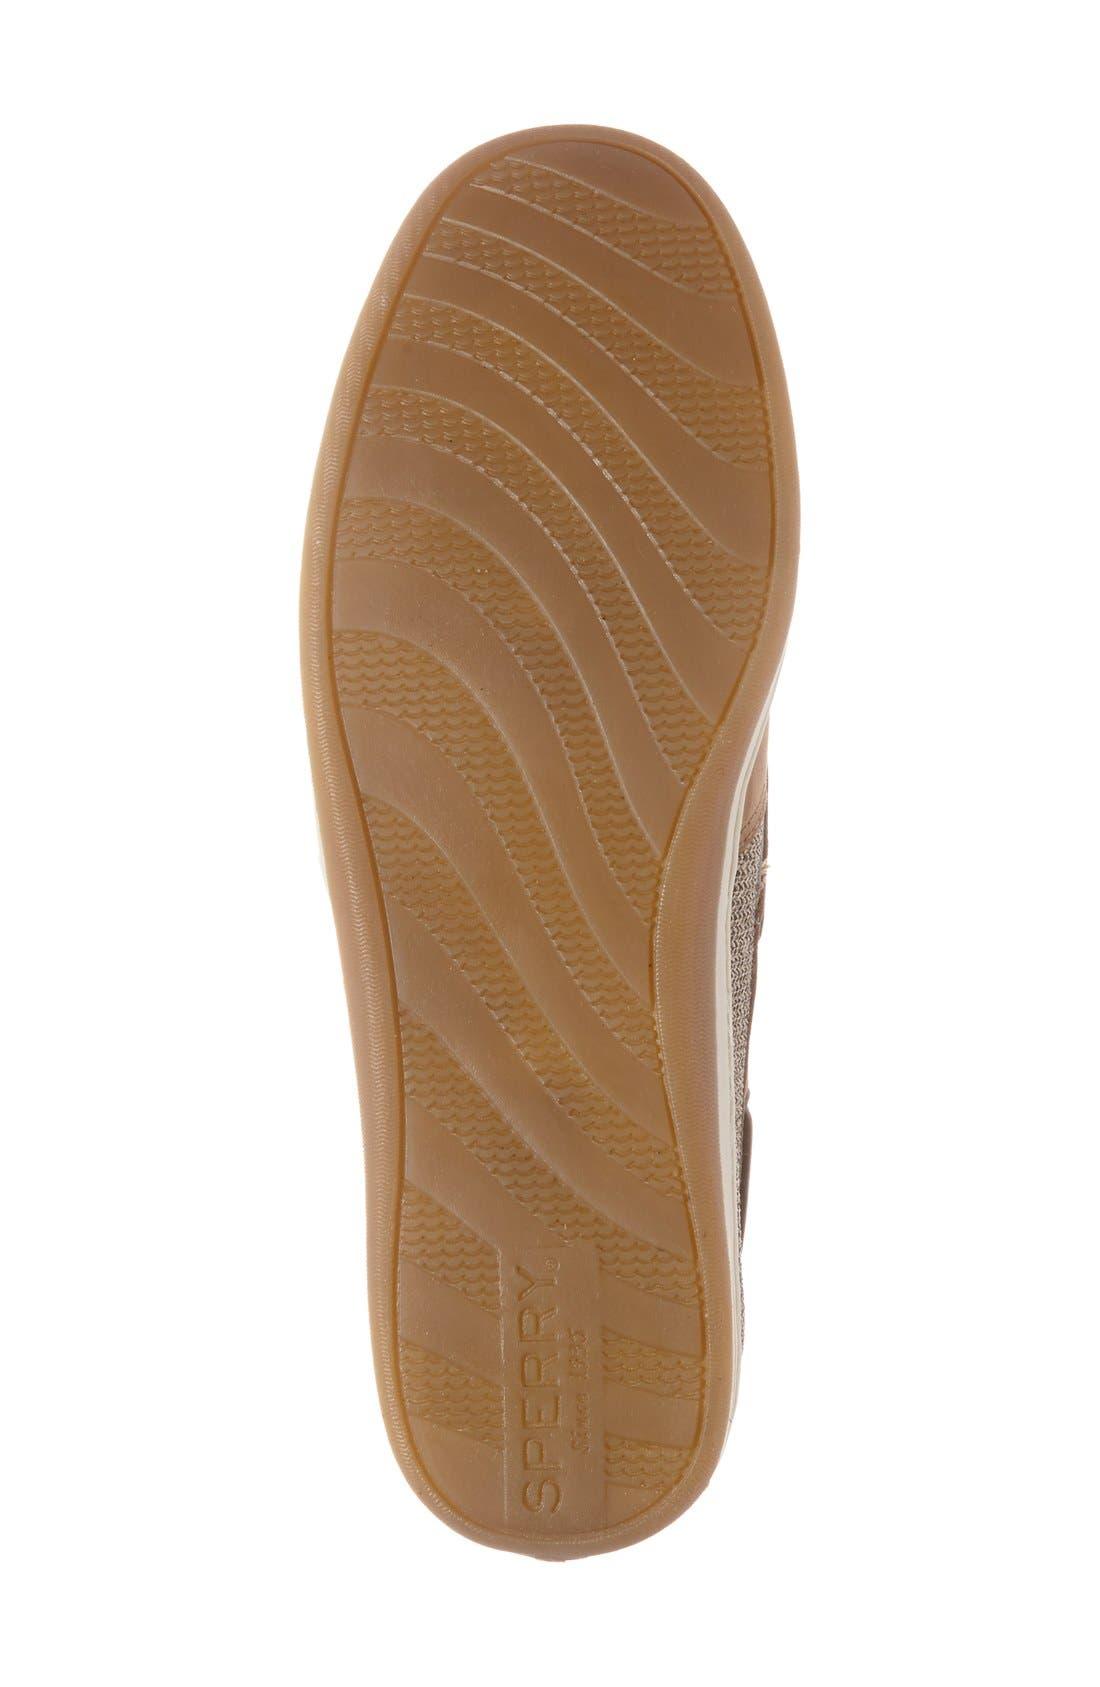 'Songfish' Boat Shoe,                             Alternate thumbnail 4, color,                             LINEN/ OAT LEATHER